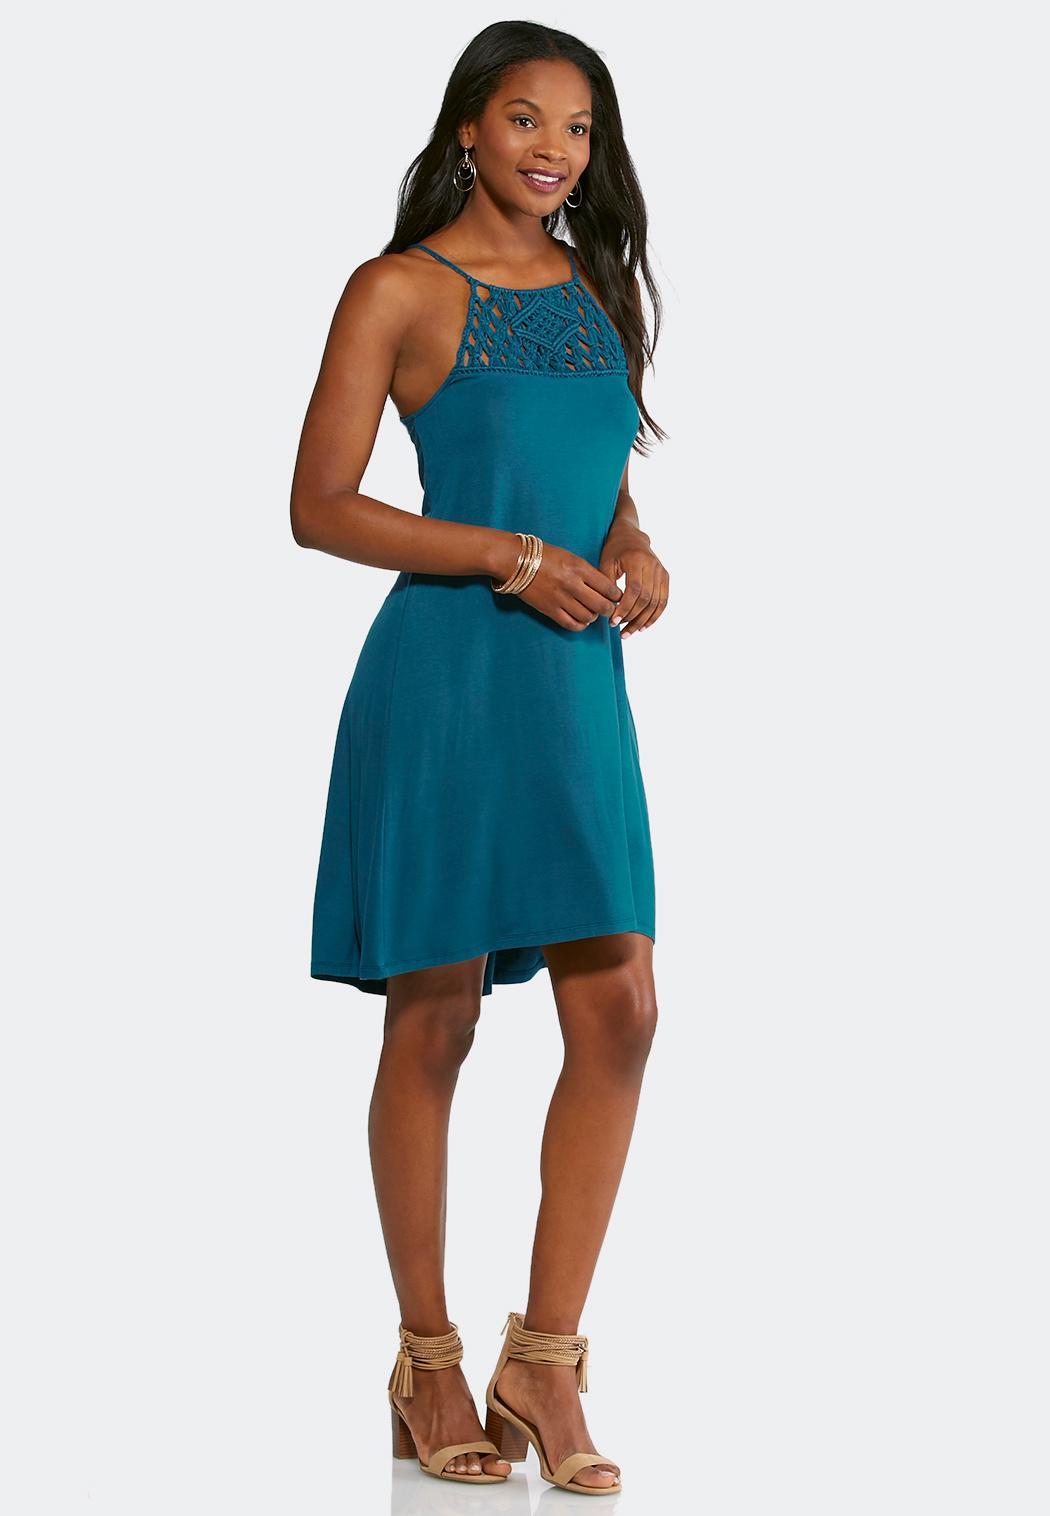 Plus Size Crochet Swing Dress Plus Sizes Cato Fashions